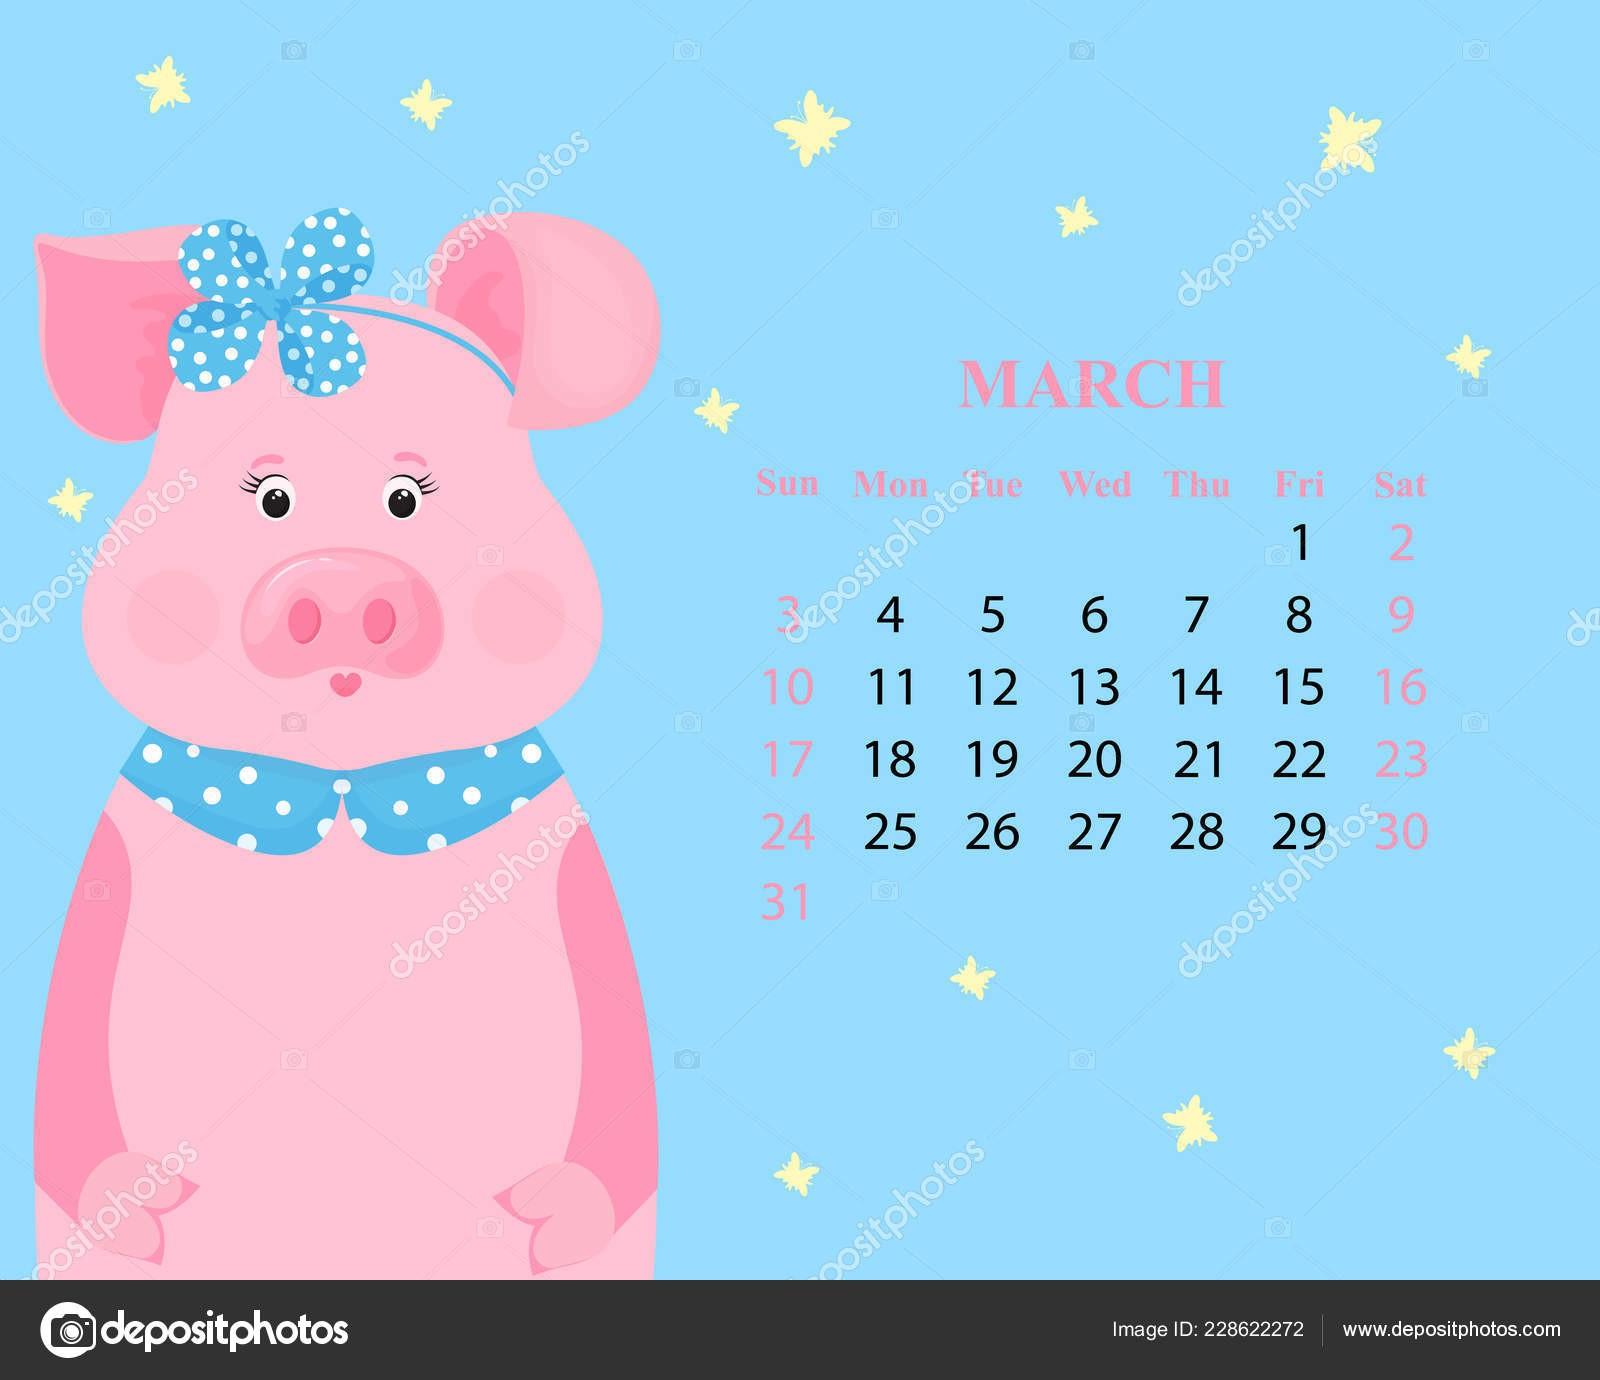 March Calendar 2019 Más Recientemente Liberado MěsÄn Kalendář Březen 2019 Roztomil½ Prase V Obruč S Lukem A Of March Calendar 2019 Actual Gujarati Calendar 2019 Printable Printed for No Cost – Calendaro